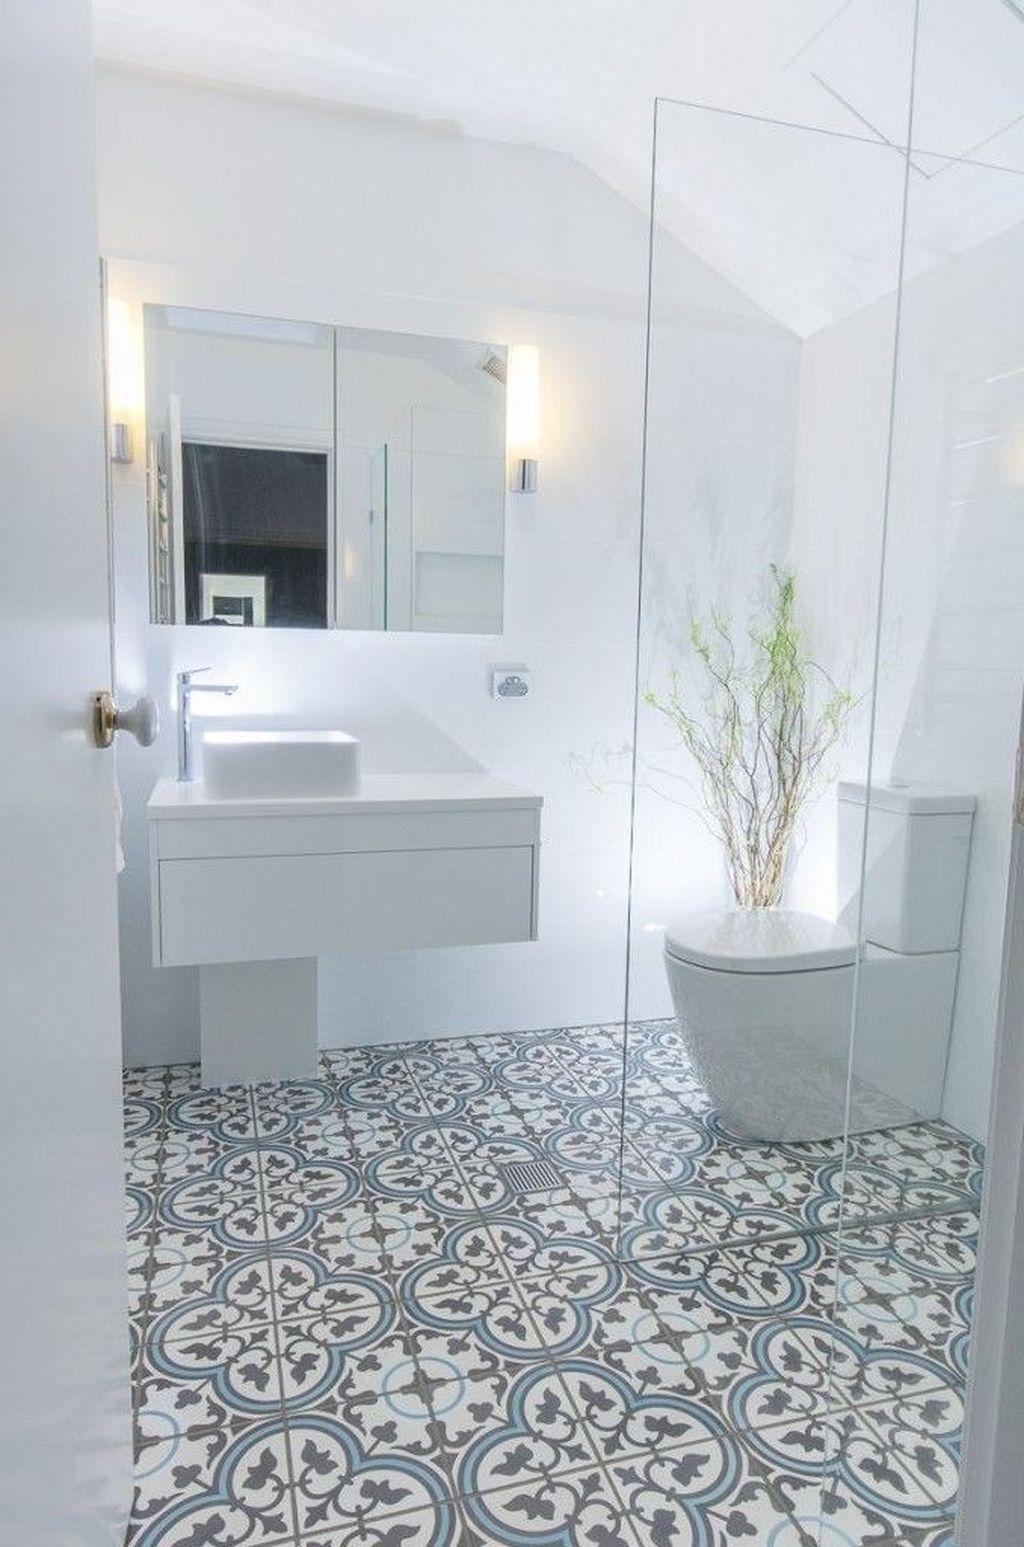 Lovely Bathroom Ceramic Tile Ideas You Should Copy 26